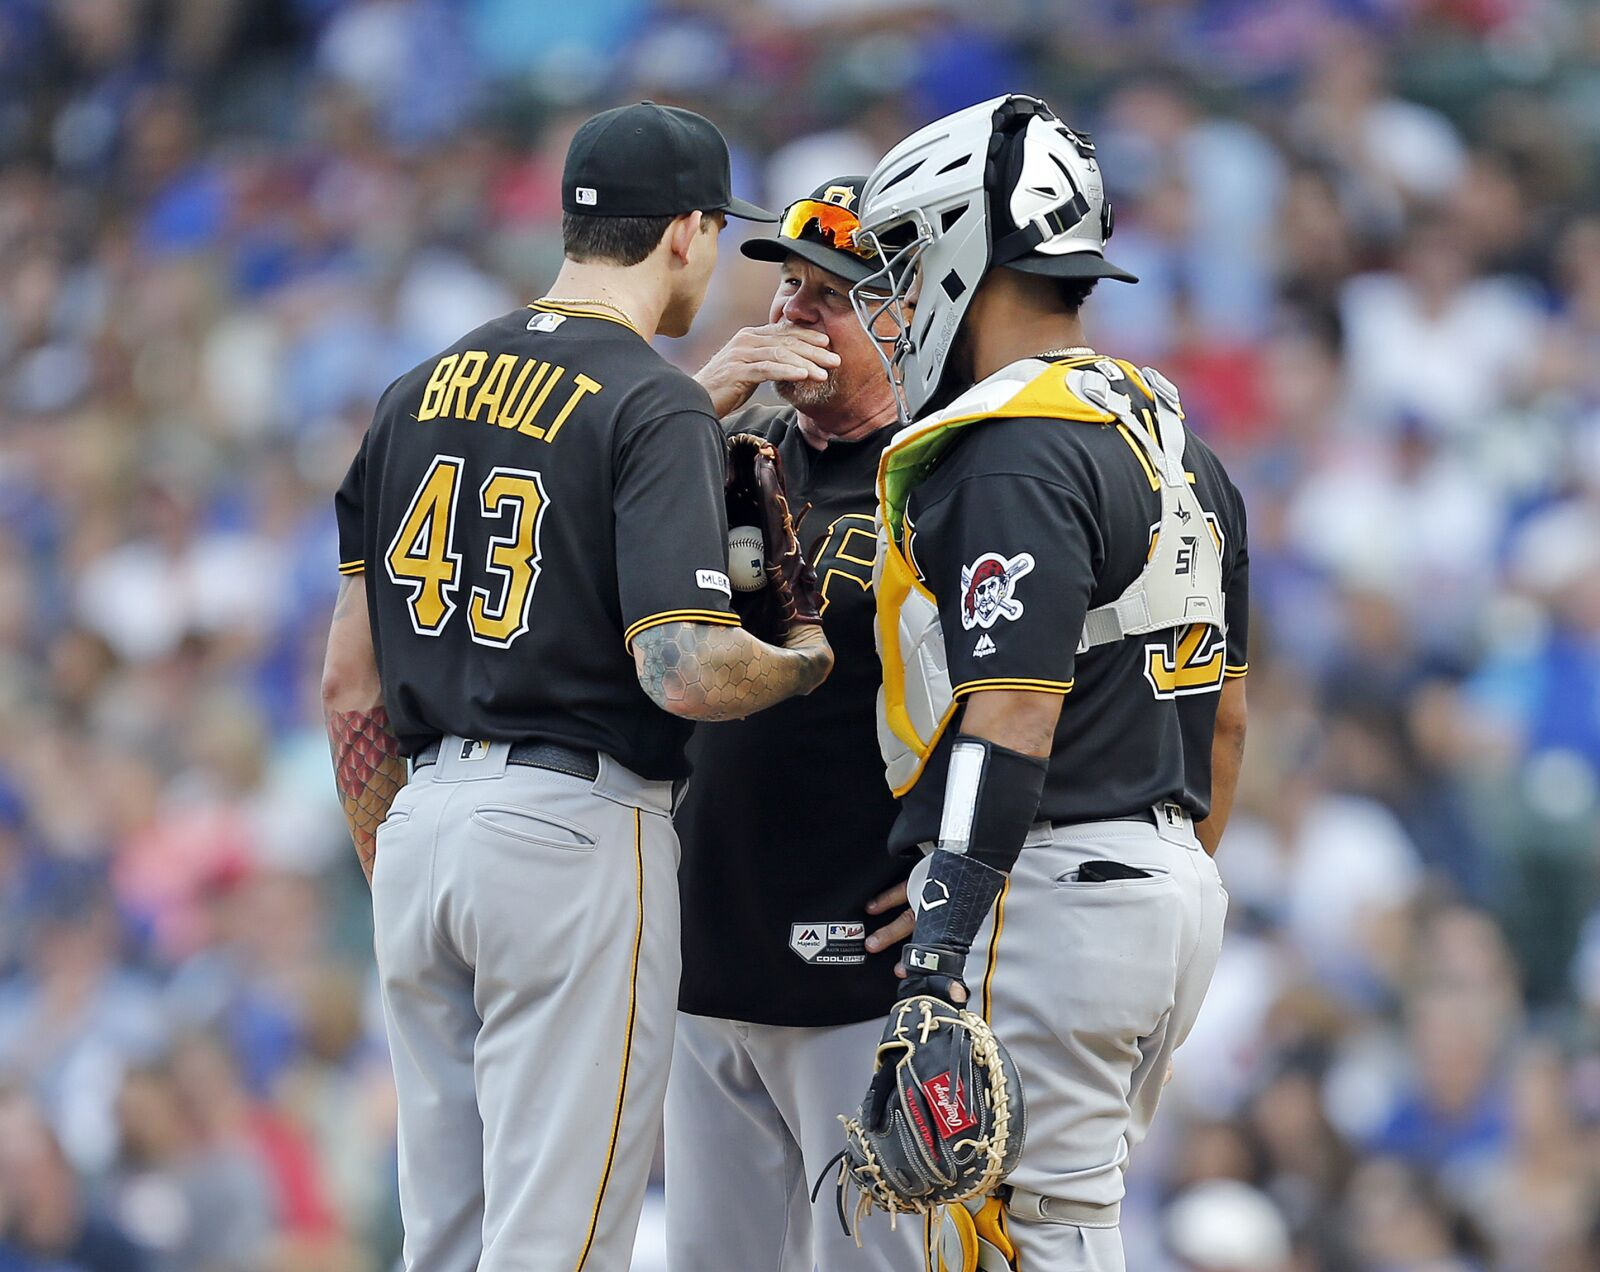 Brault: The Longest Home Runs in MLB During Week-24